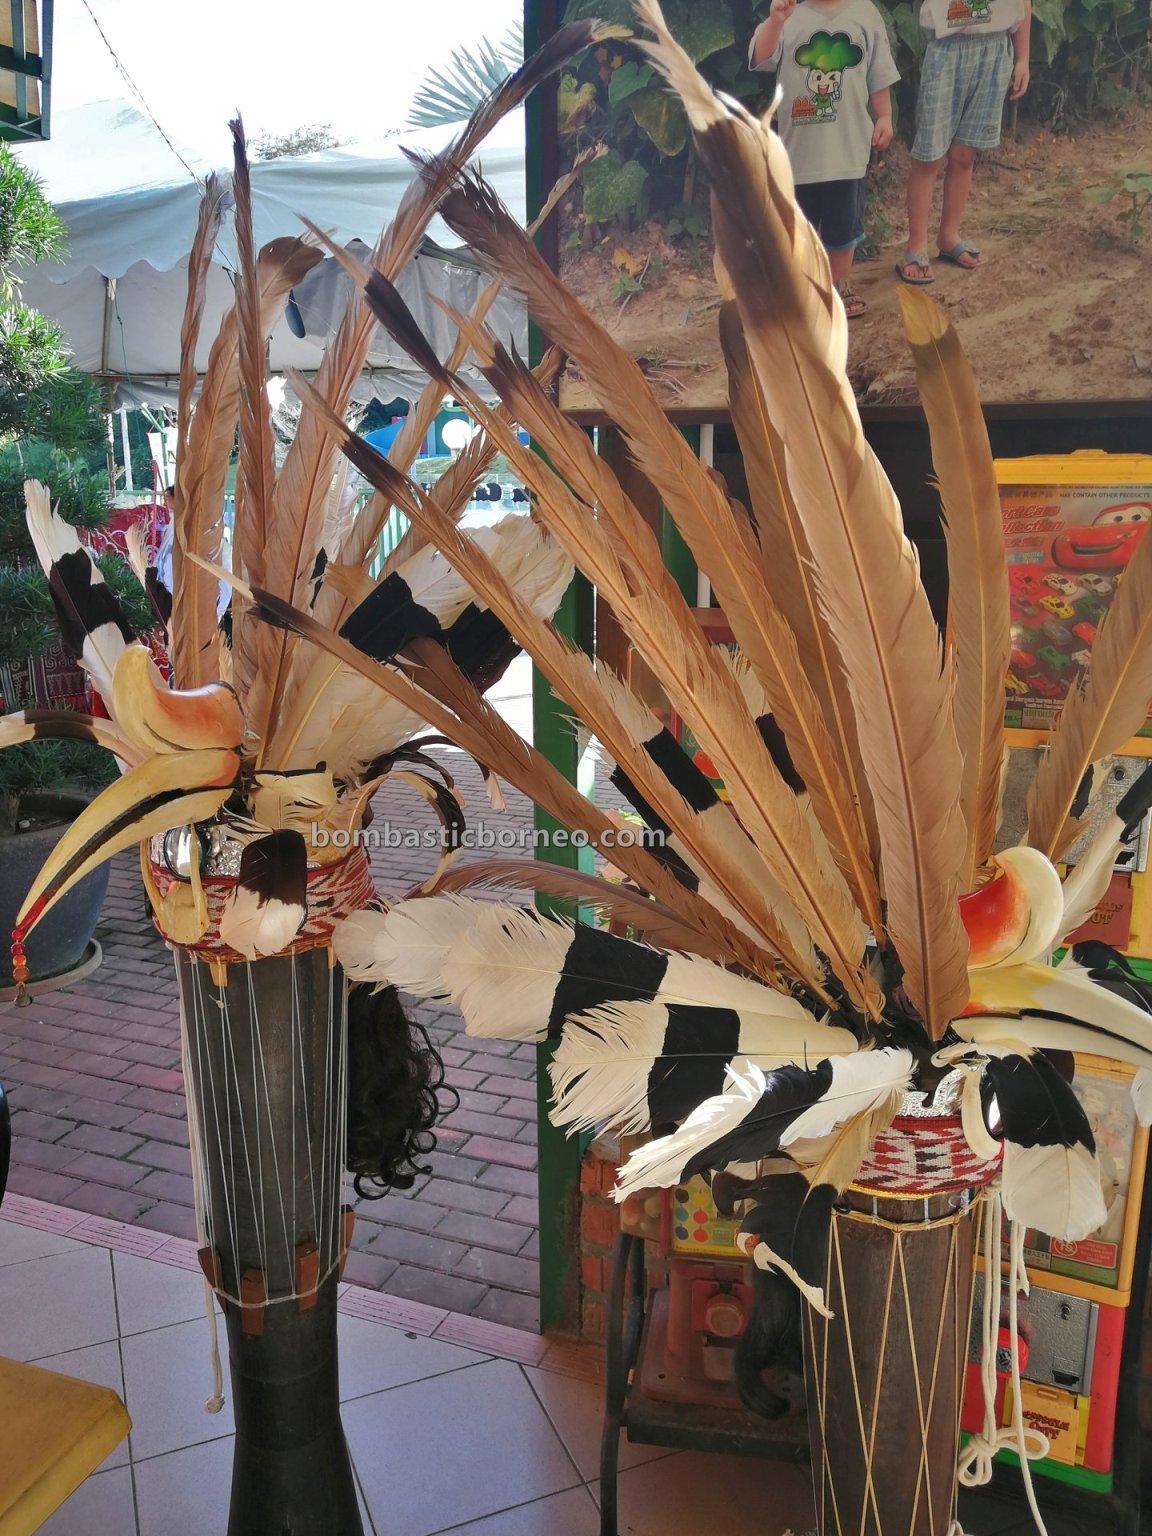 Borneo Youth Sape Festival, authentic, event, native, tribe, musical instrument, Sibu, Malaysia, Tourism, tourist attraction, travel guide, Trans Border, 探索婆罗洲游踪, 砂拉越原住民音乐, 马来西亚达雅吉他